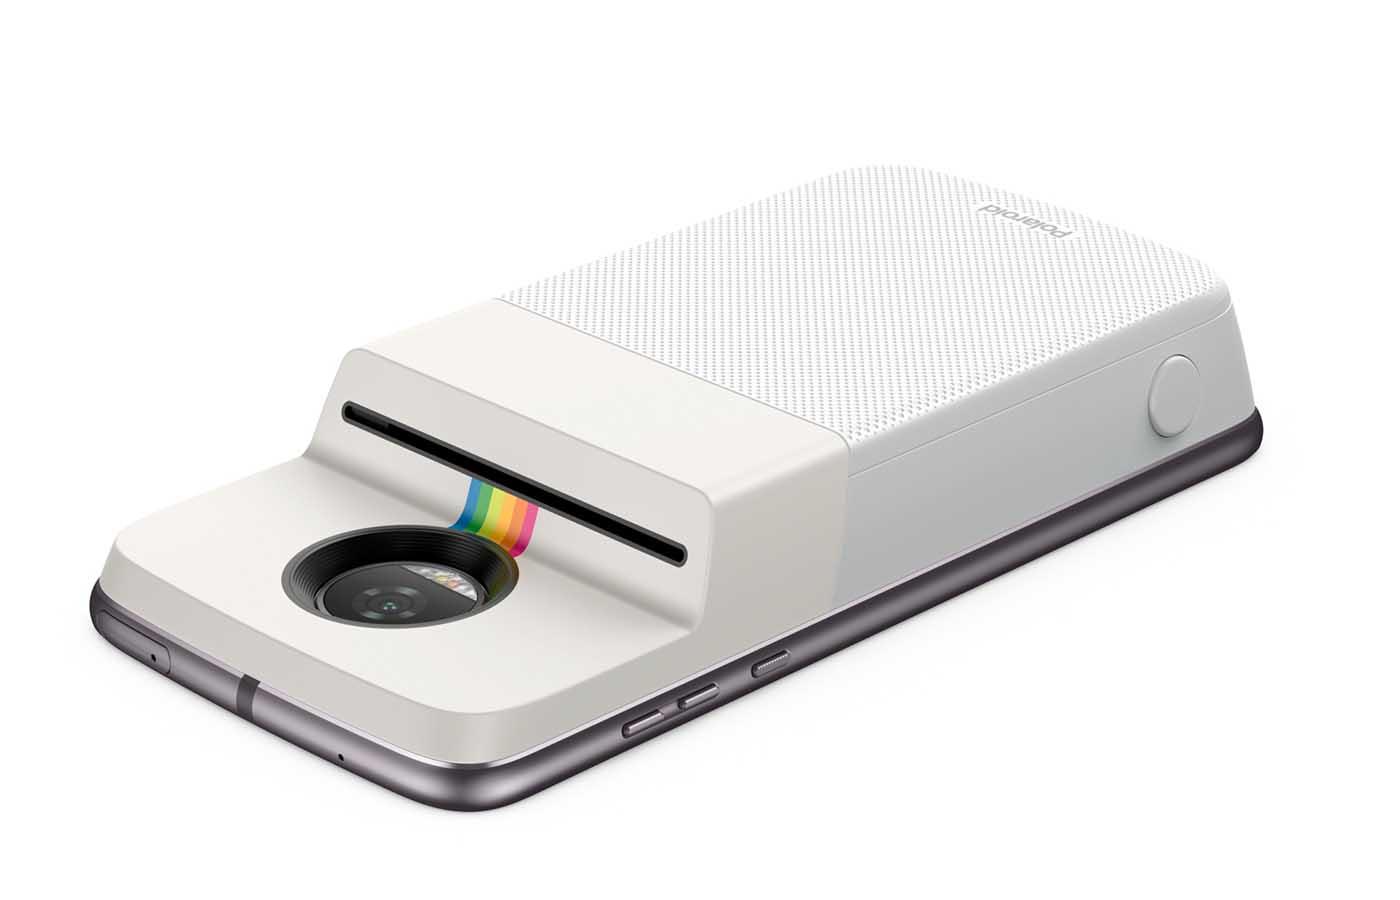 El nuevo Moto Mod Polaroid Insta-Share Printer